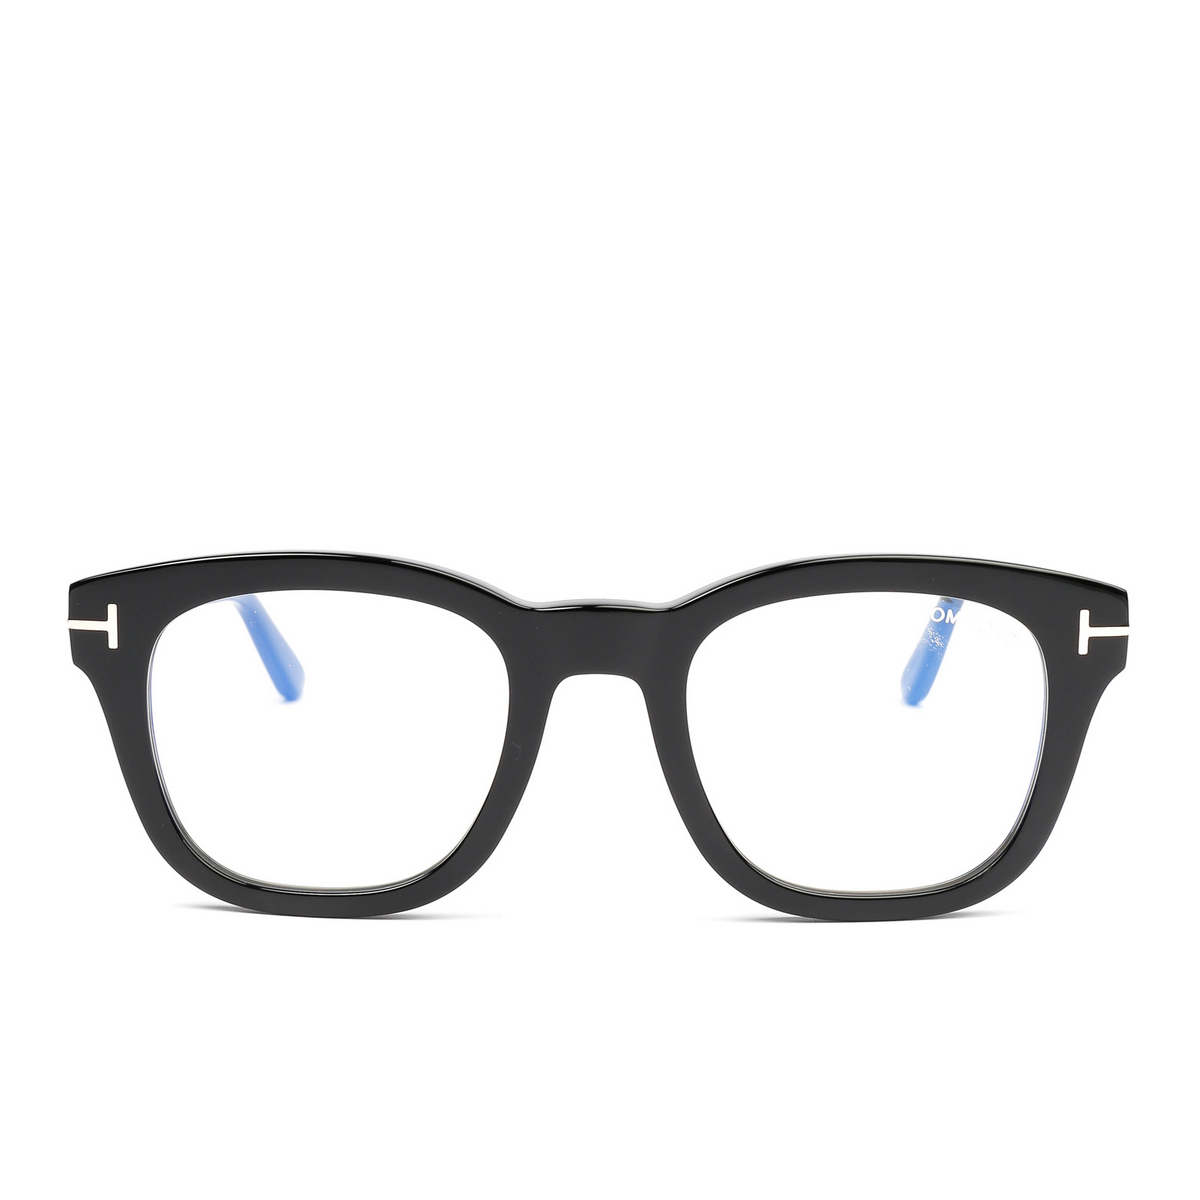 Tom Ford® Square Eyeglasses: FT5542-B color Black 001 - front view.